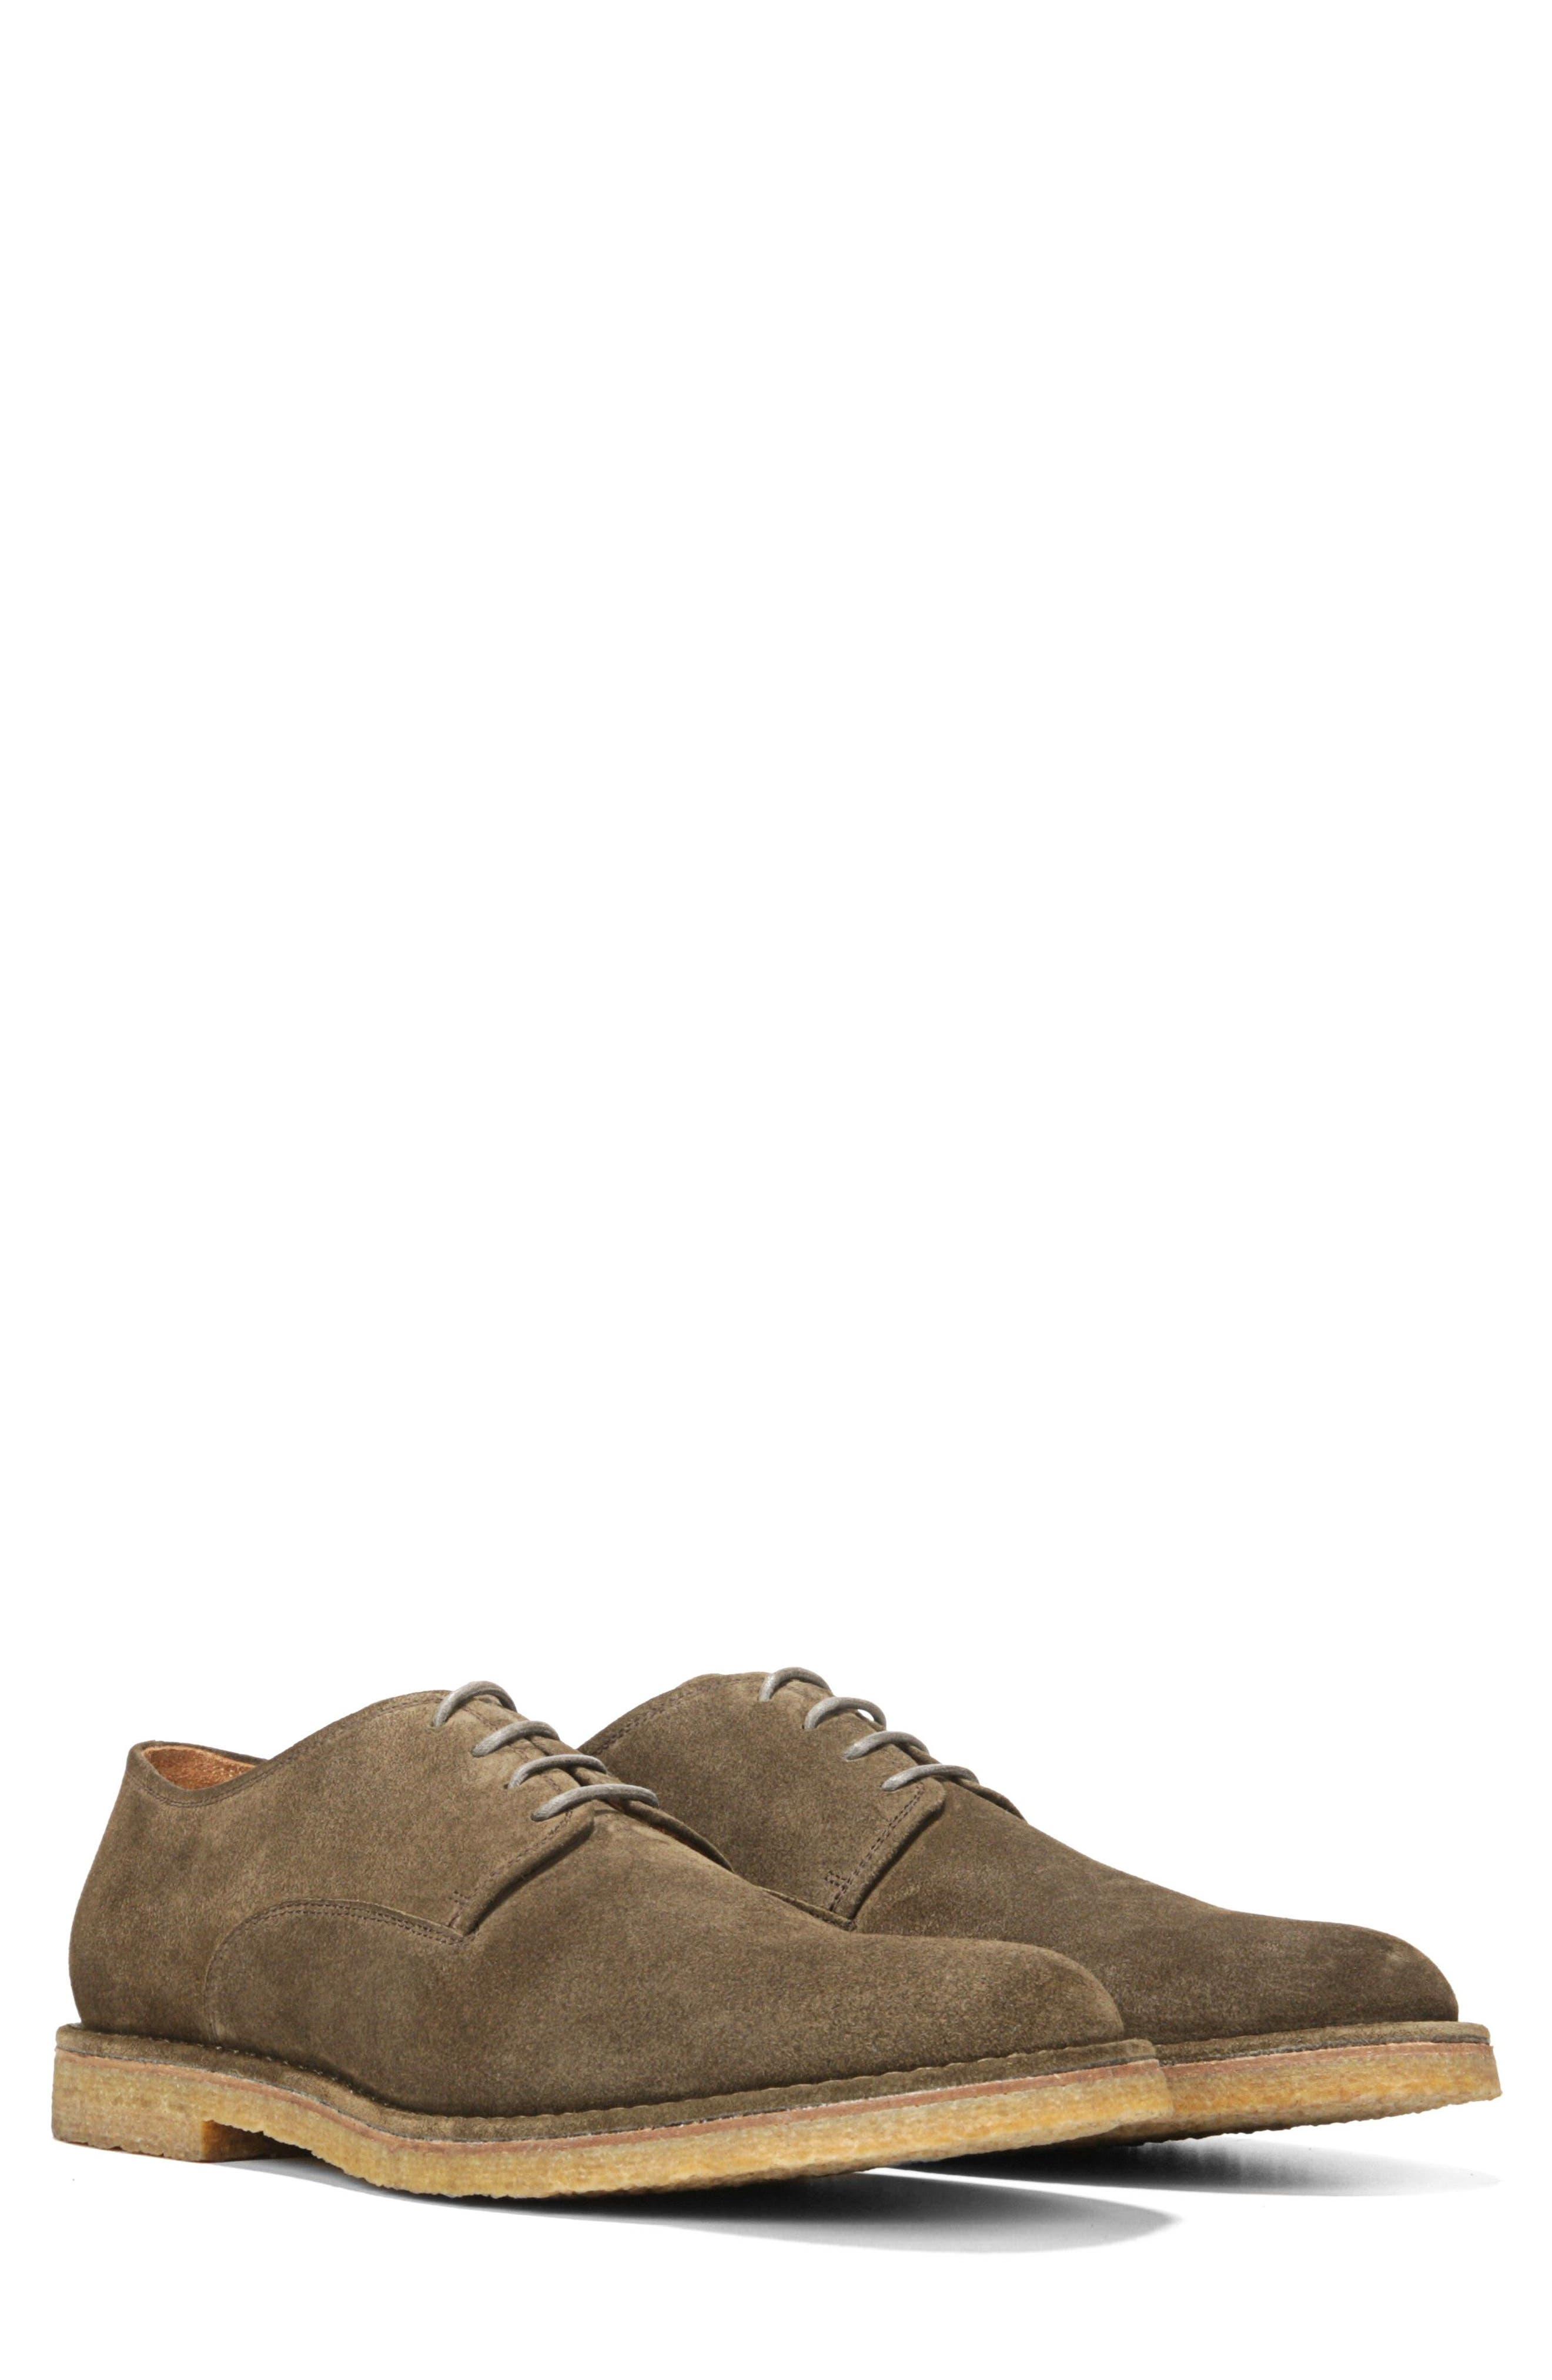 Stetson Buck Shoe,                             Alternate thumbnail 7, color,                             205